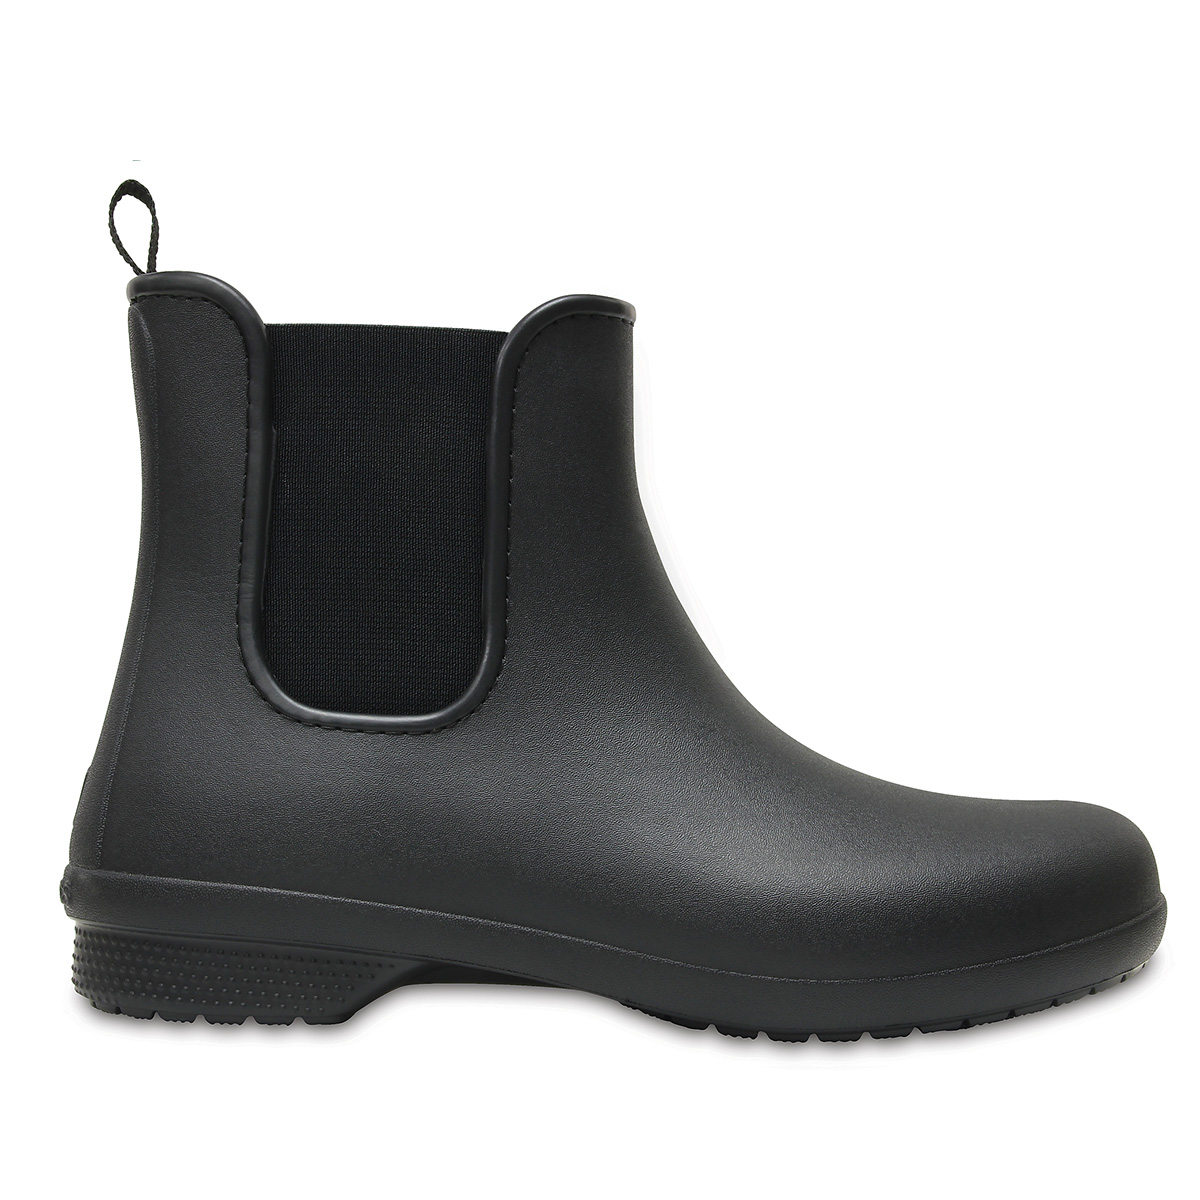 Crocs Freesail Chelsea Boot W - Siyah/Siyah